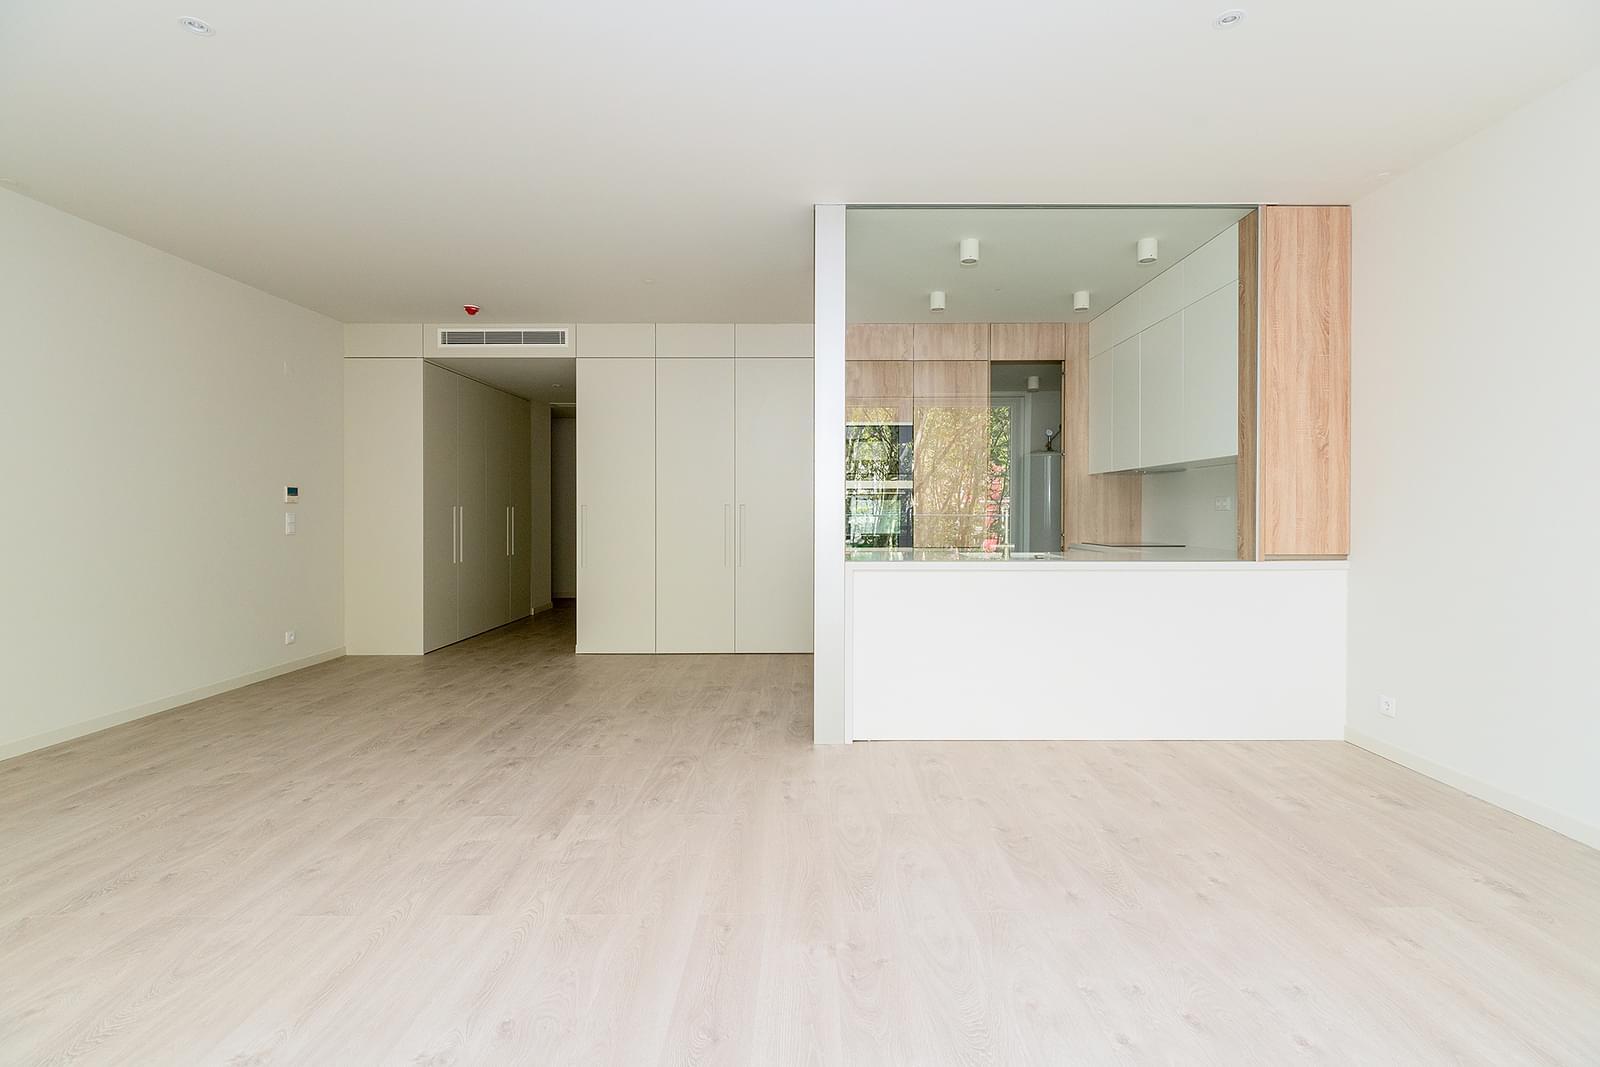 pf18308-apartamento-t2-lisboa-a1279f83-7910-40b0-ae49-b4925e553bad